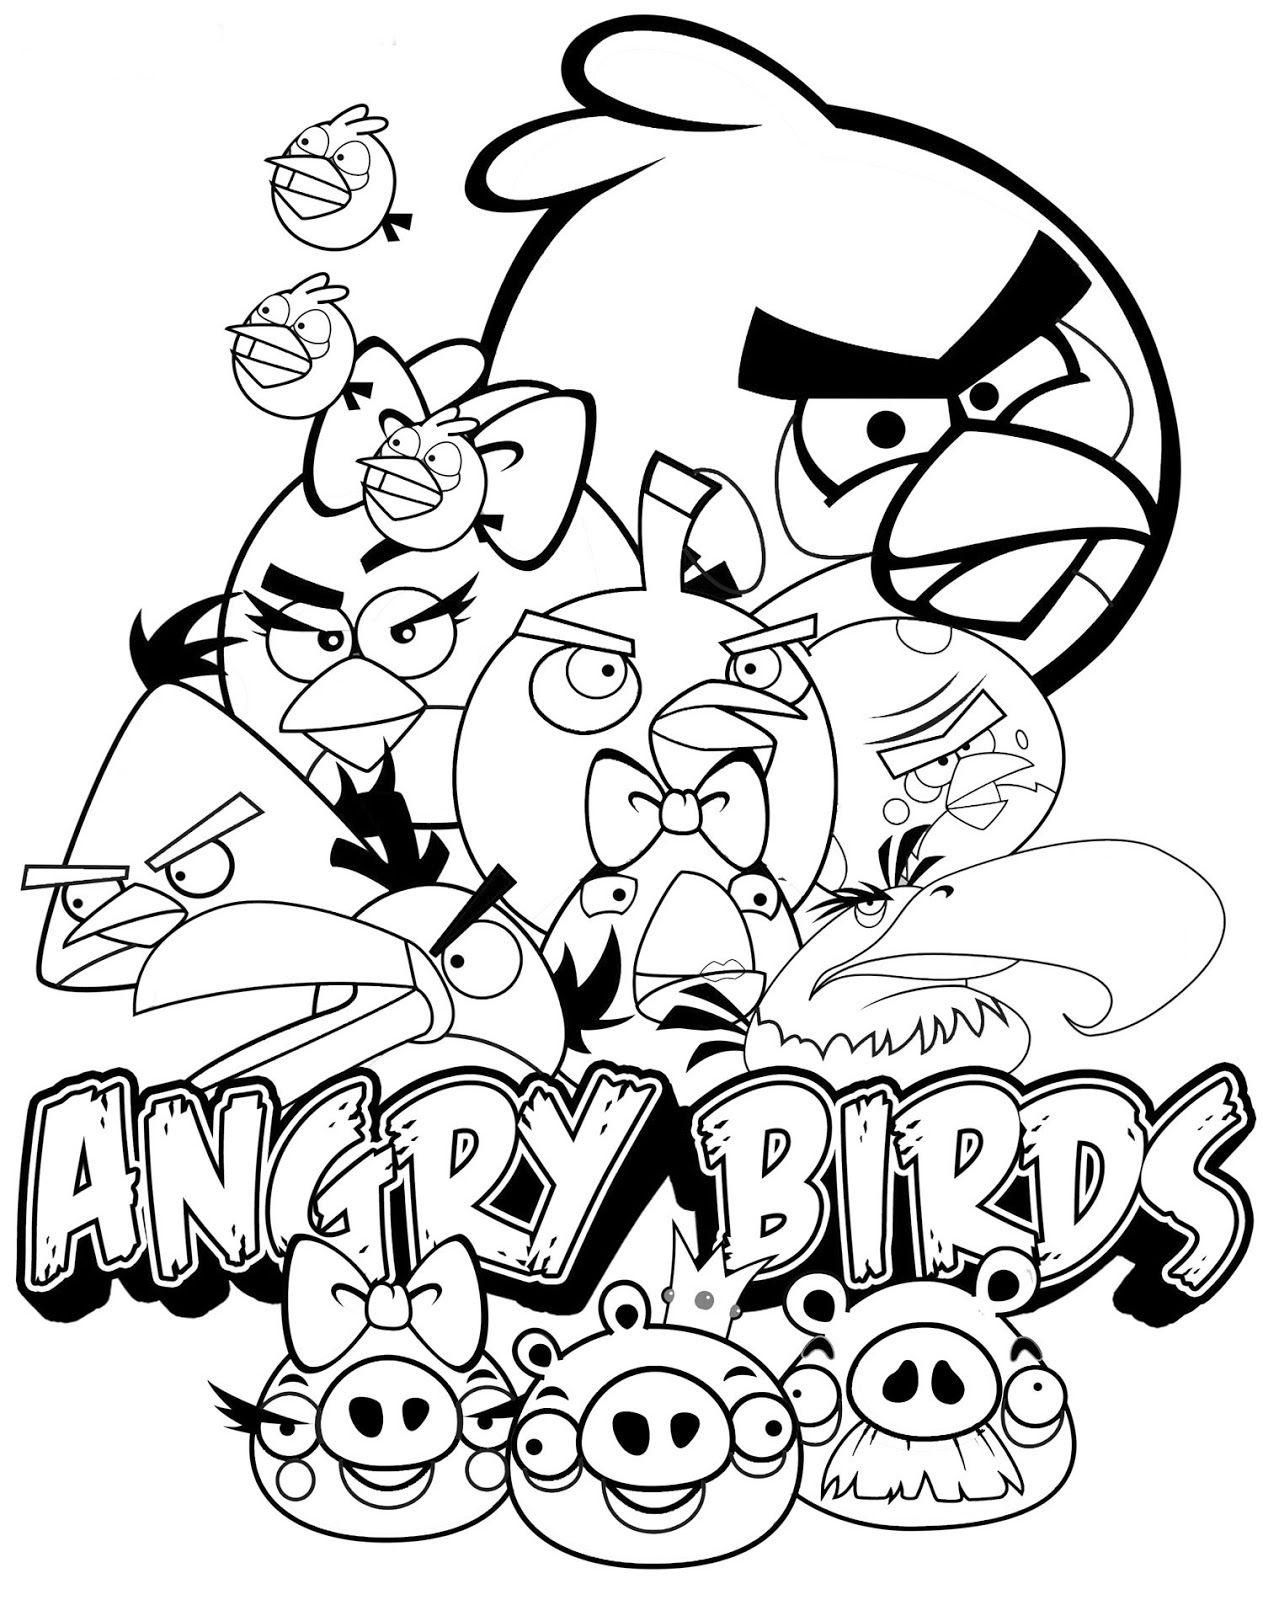 Angry Birds Kleurplaten Poster Bird Coloring Pages Coloring Pages Star Wars Coloring Book